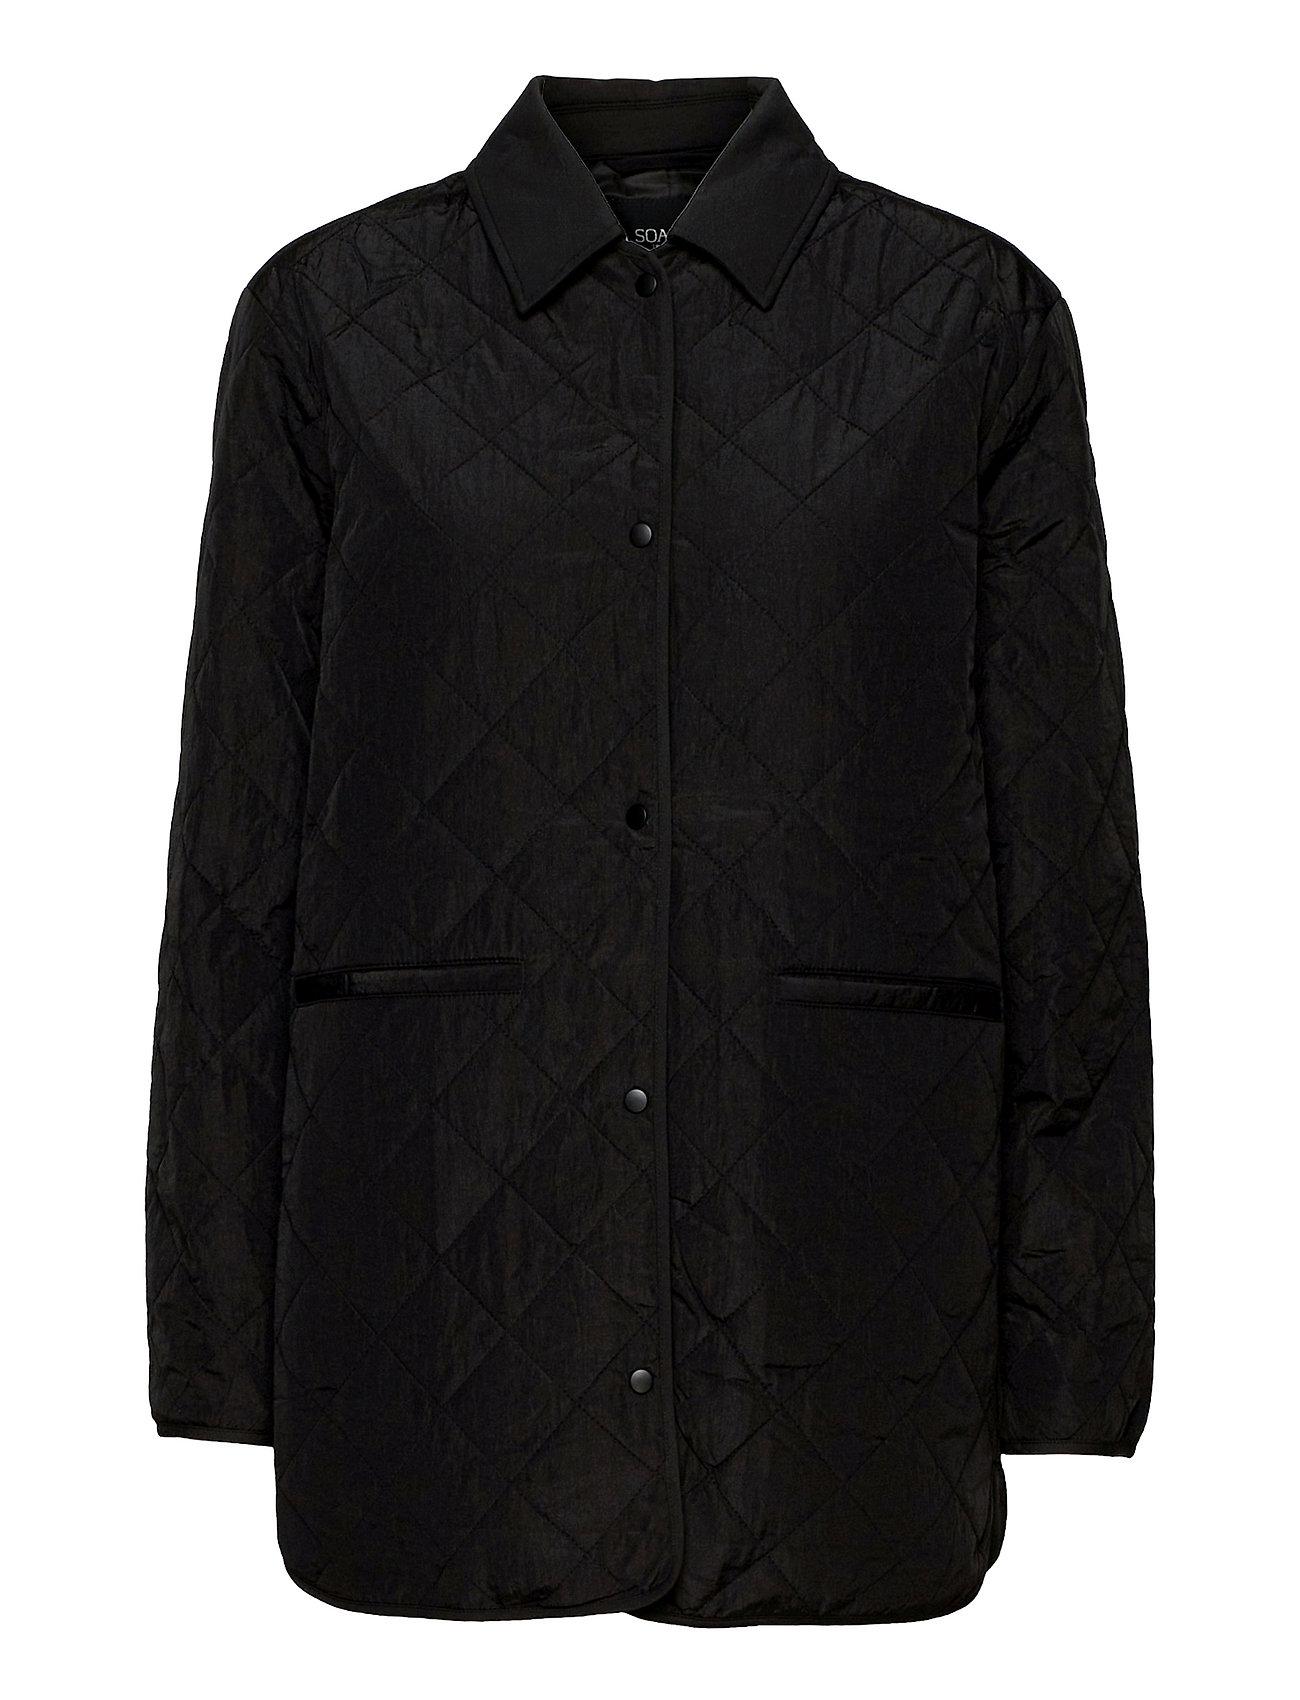 Slumina Jacket Quiltet Jakke Sort Soaked In Luxury